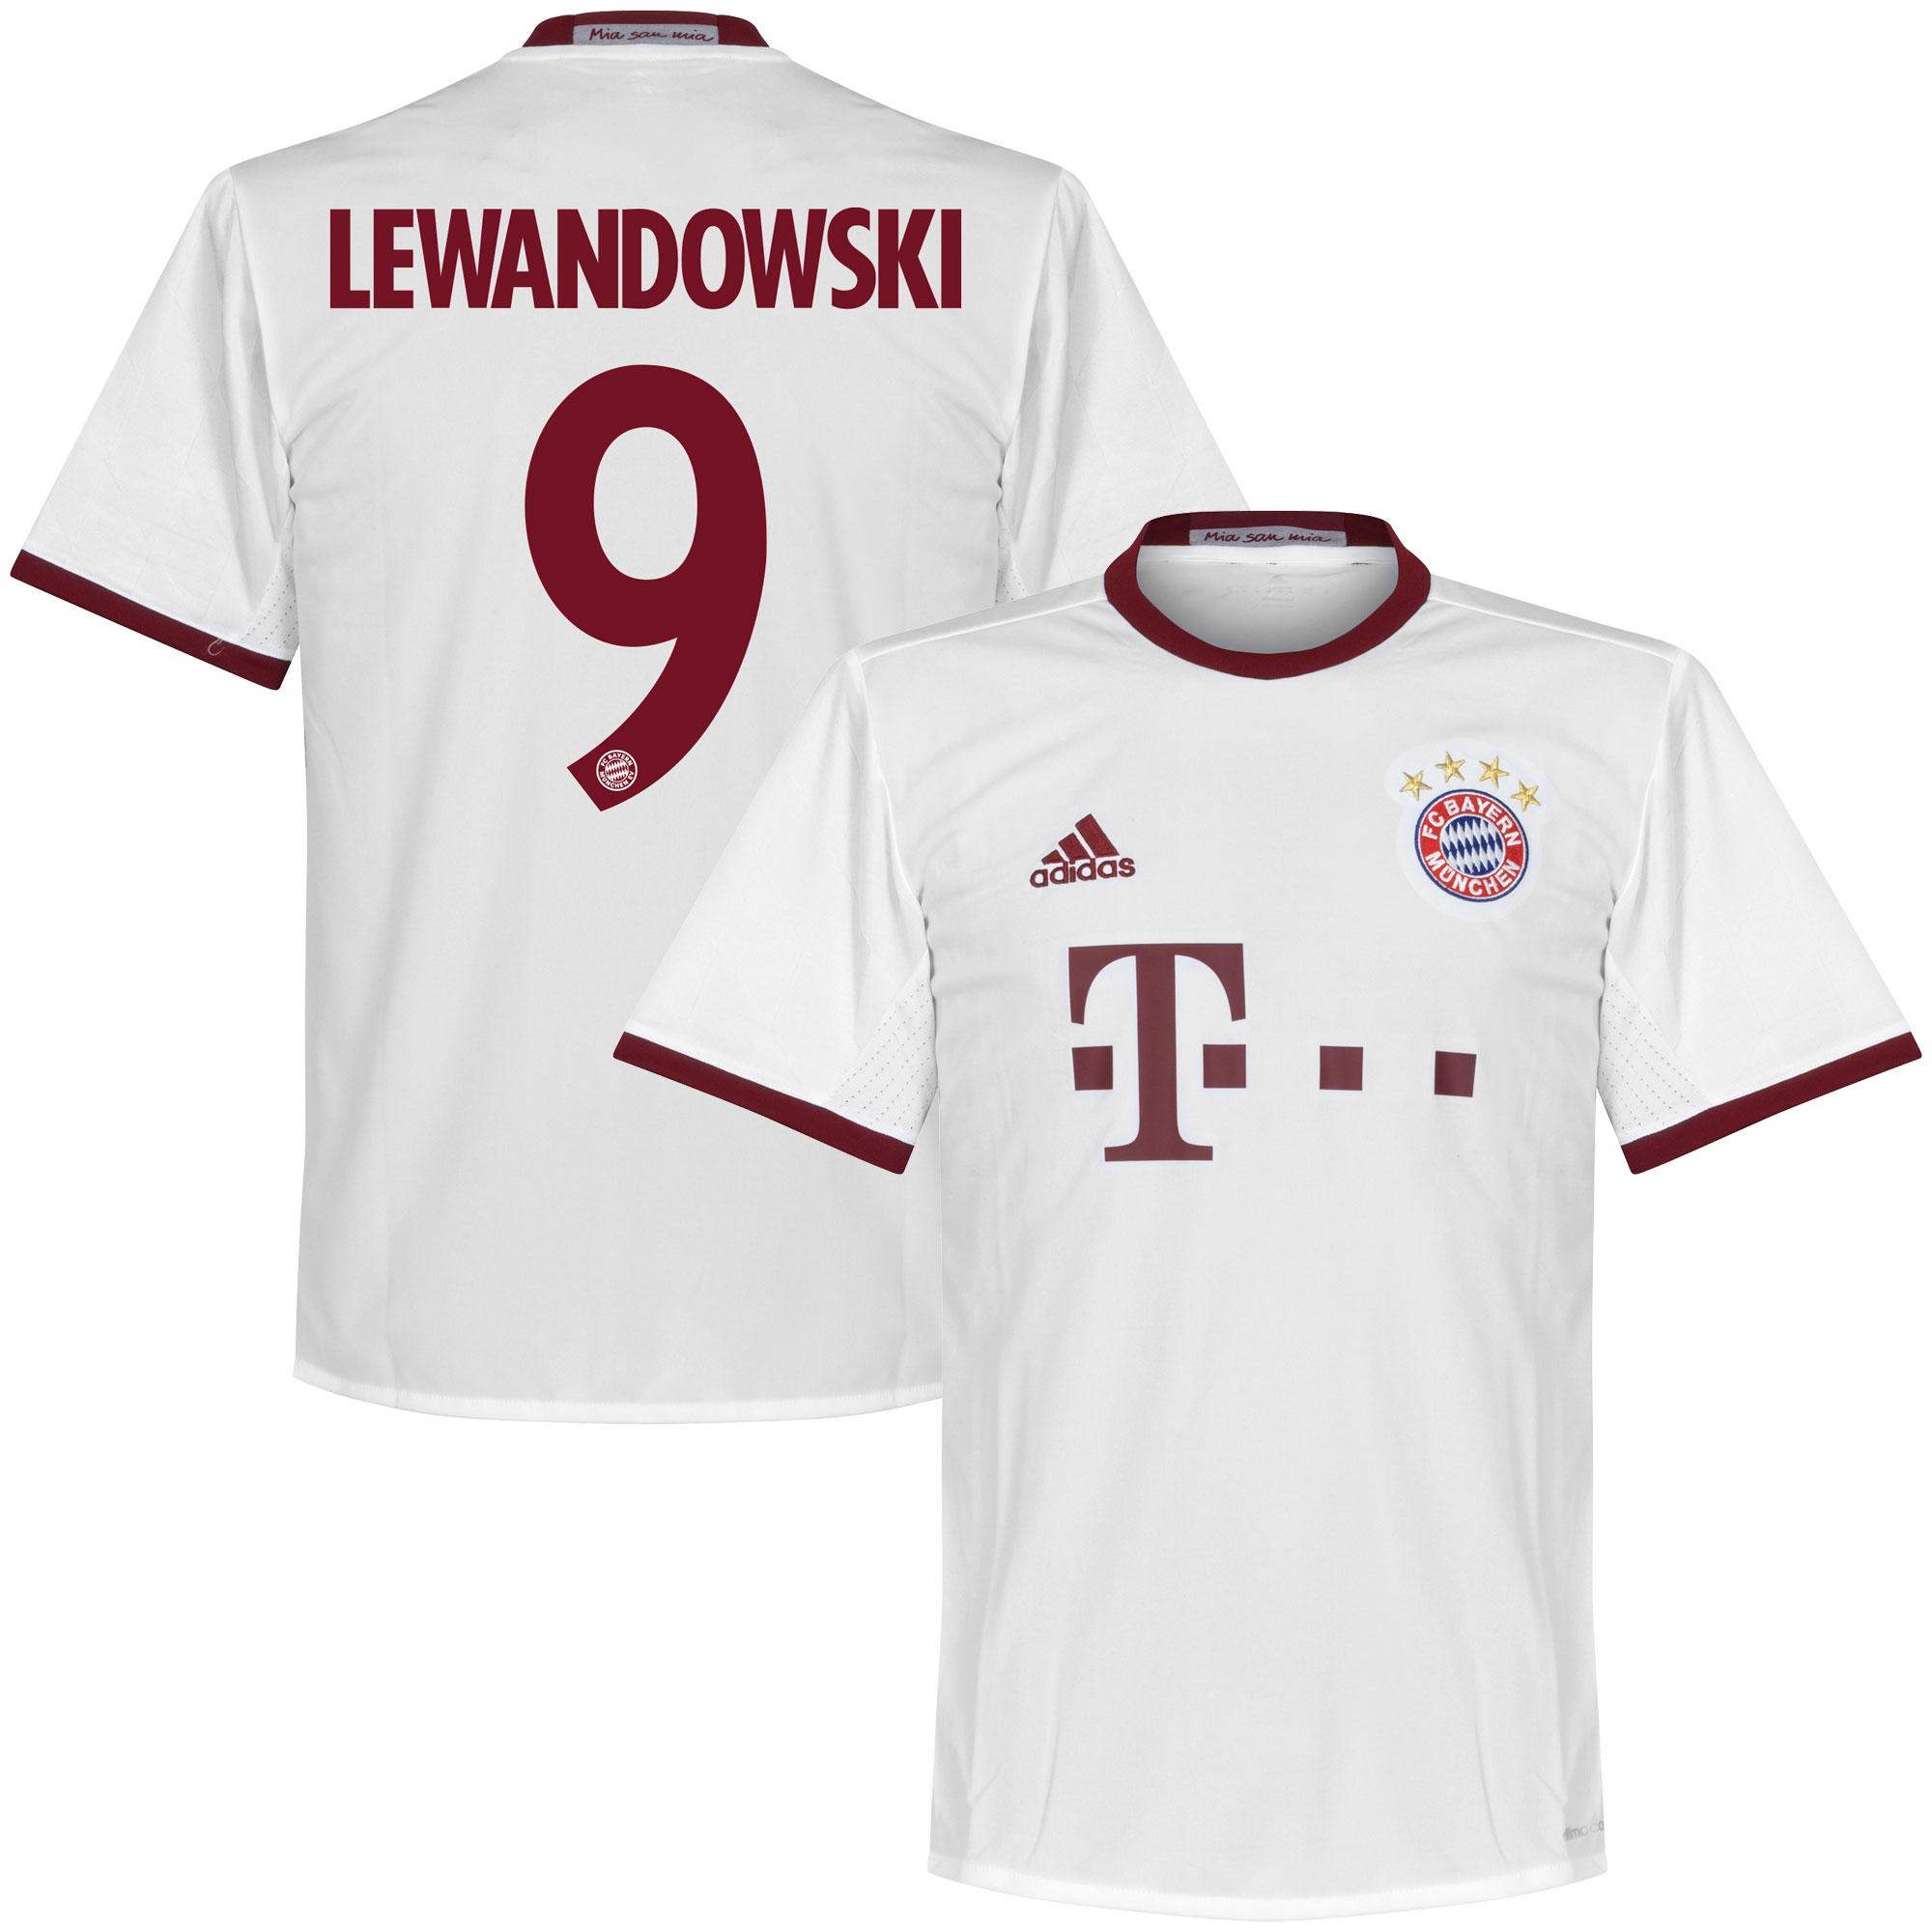 Bayern Munich 3rd Lewandowski Jersey 2016 / 2017 (Official Printing) - 66